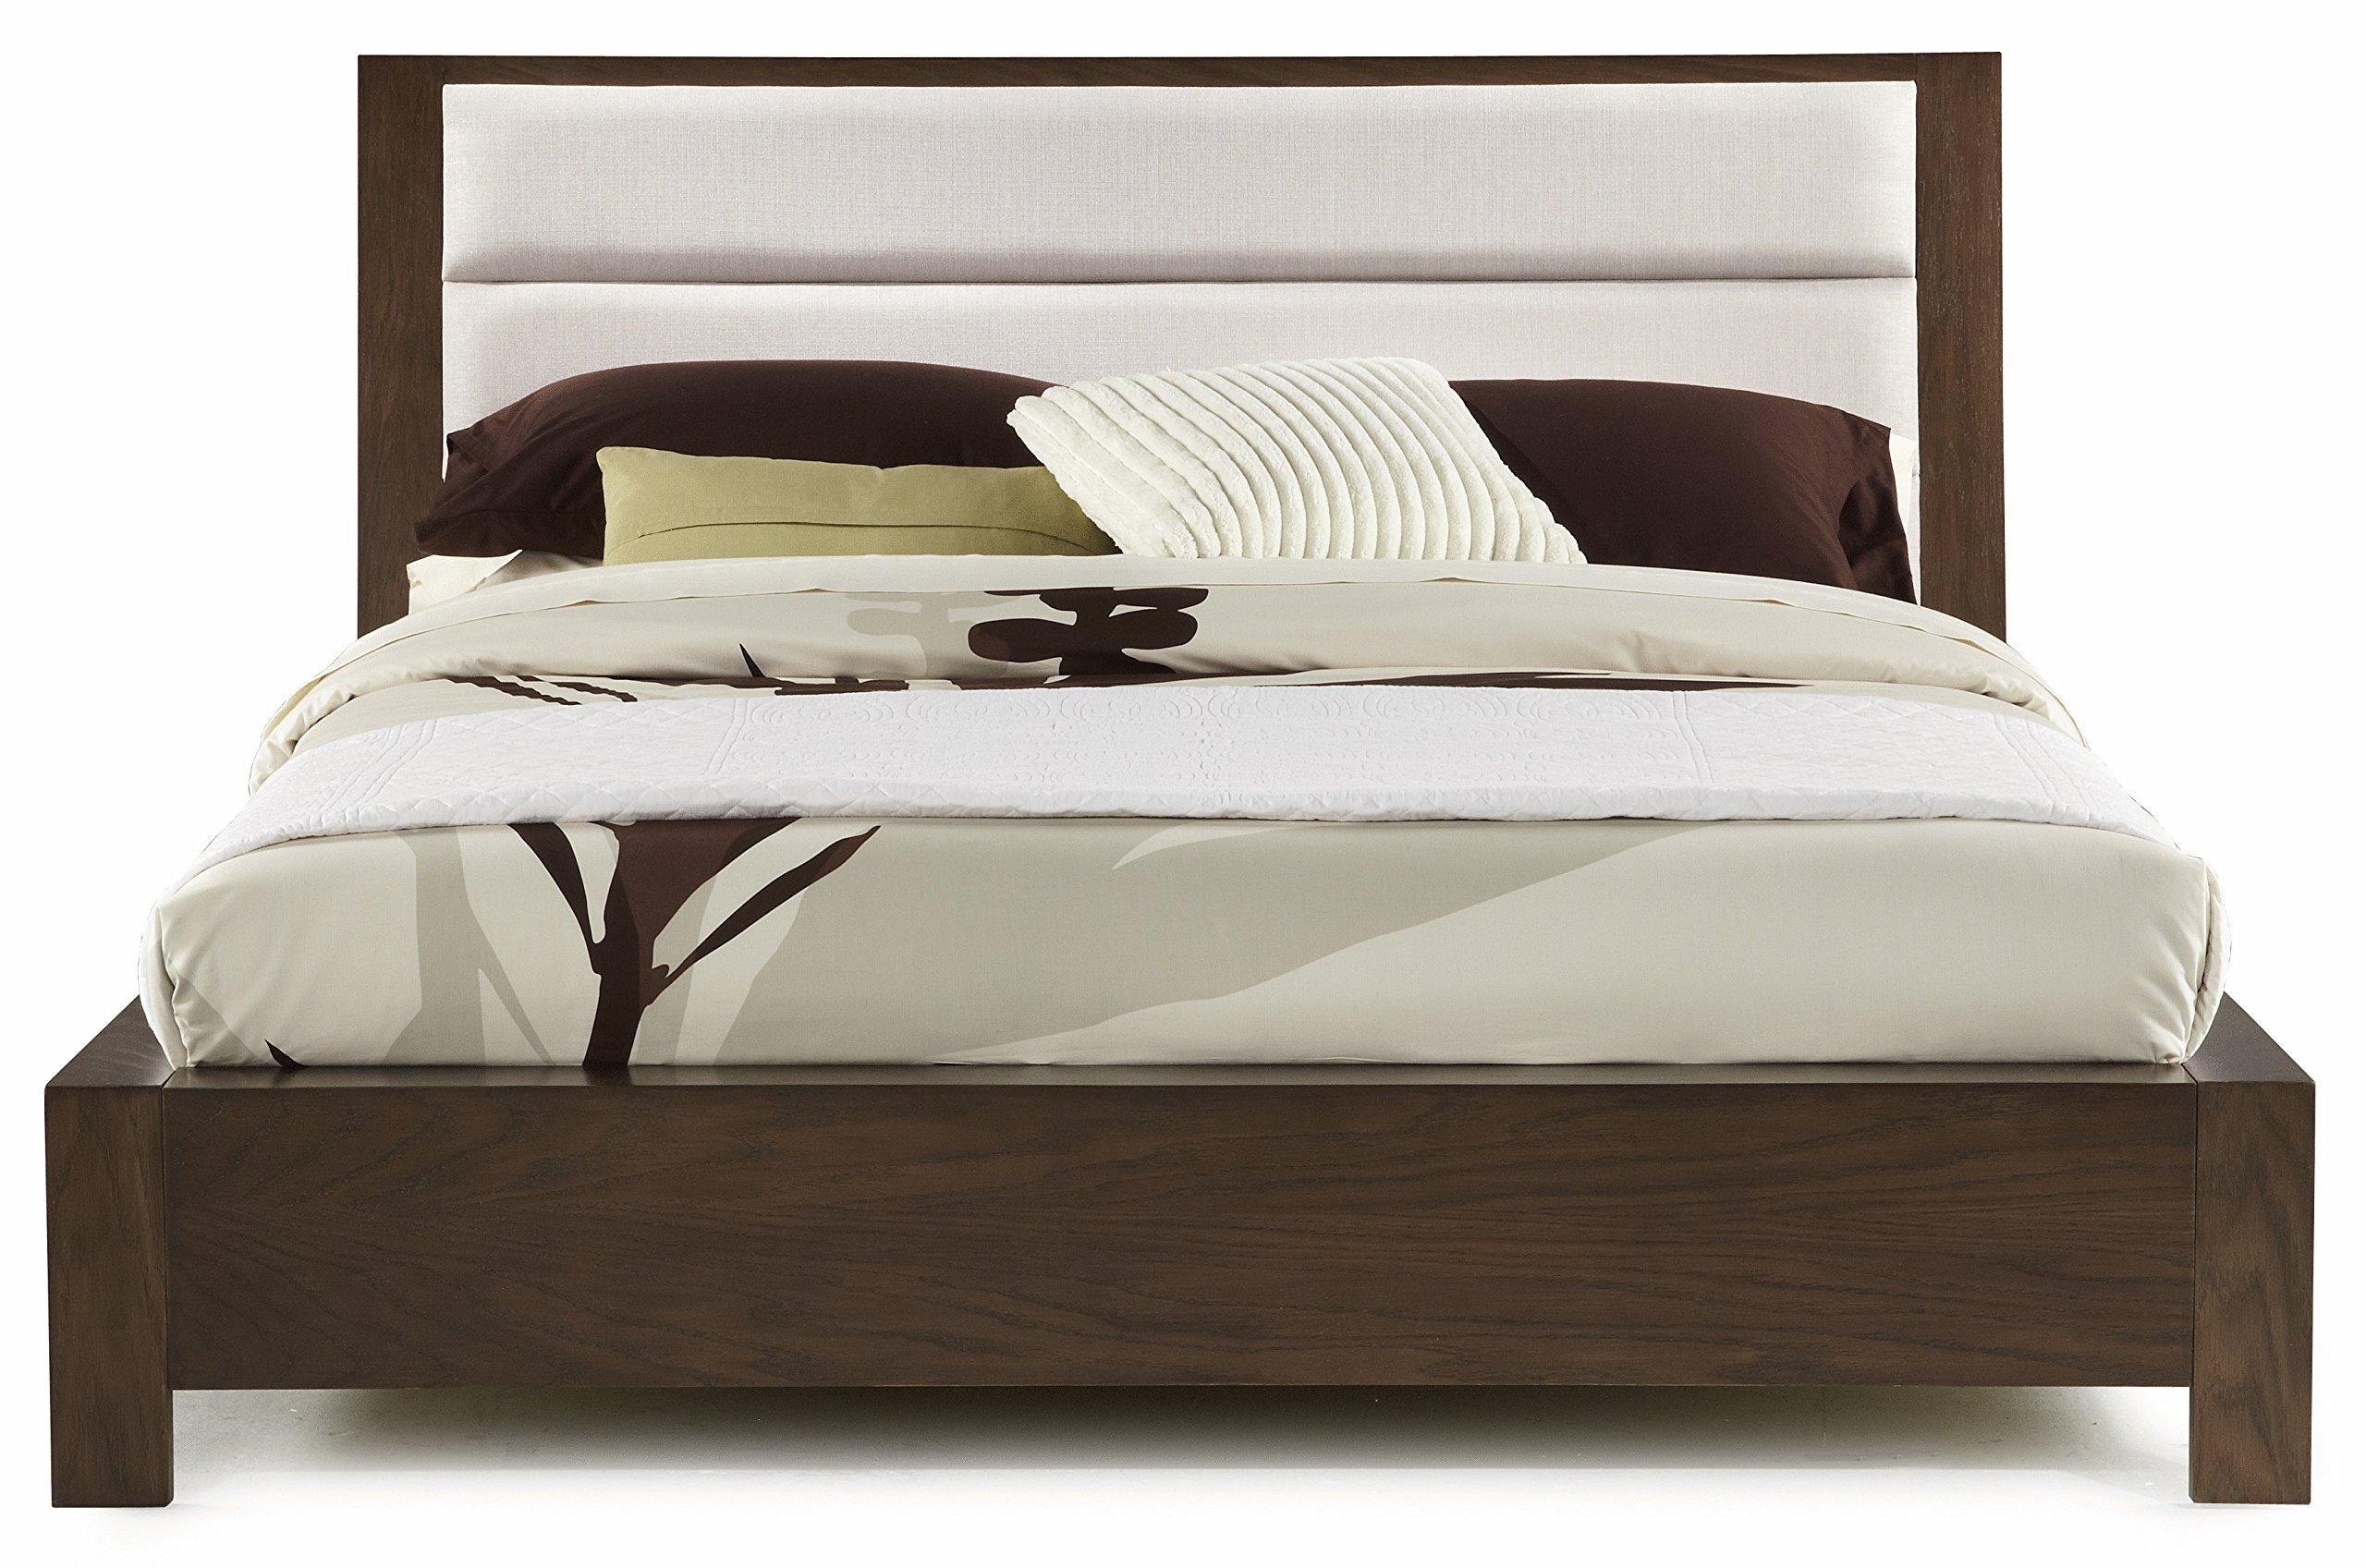 Casana Furniture Company 525-901KQ Hudson Upholstered Platform Bed, Queen